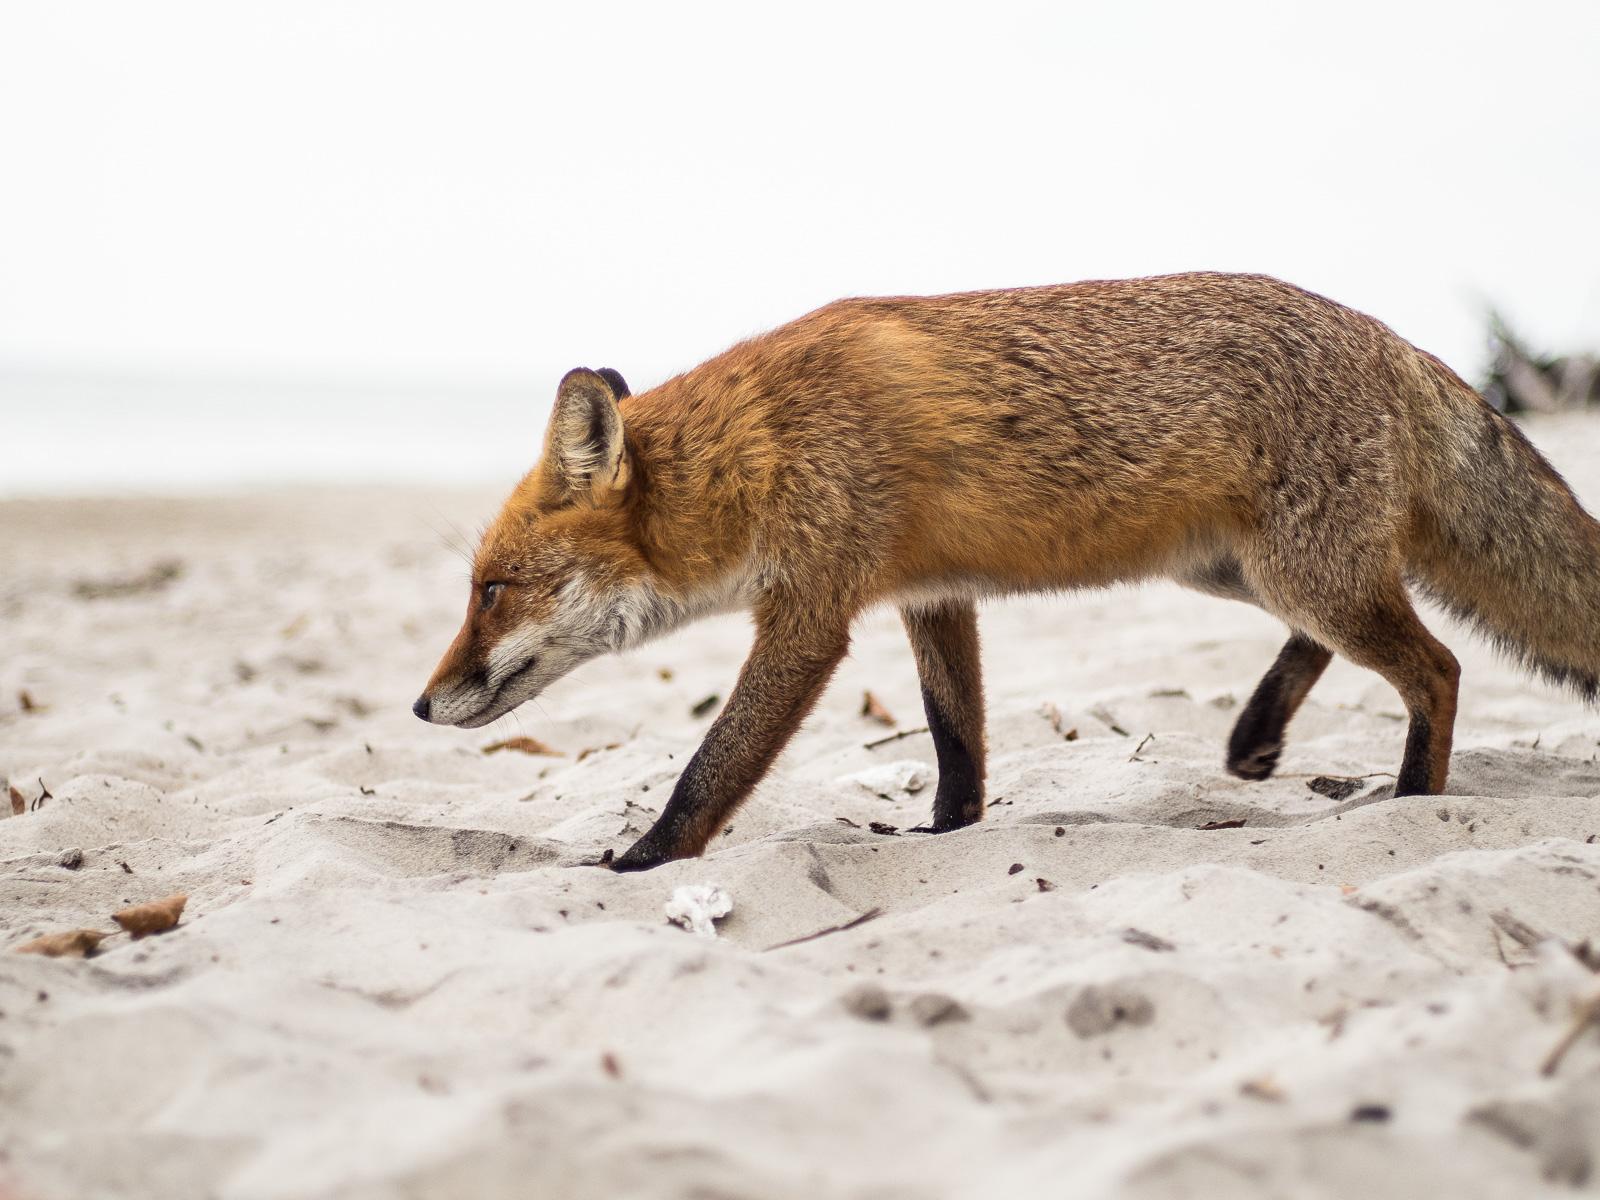 Fuchs am Darßer Weststrand, fast komplett, Profil